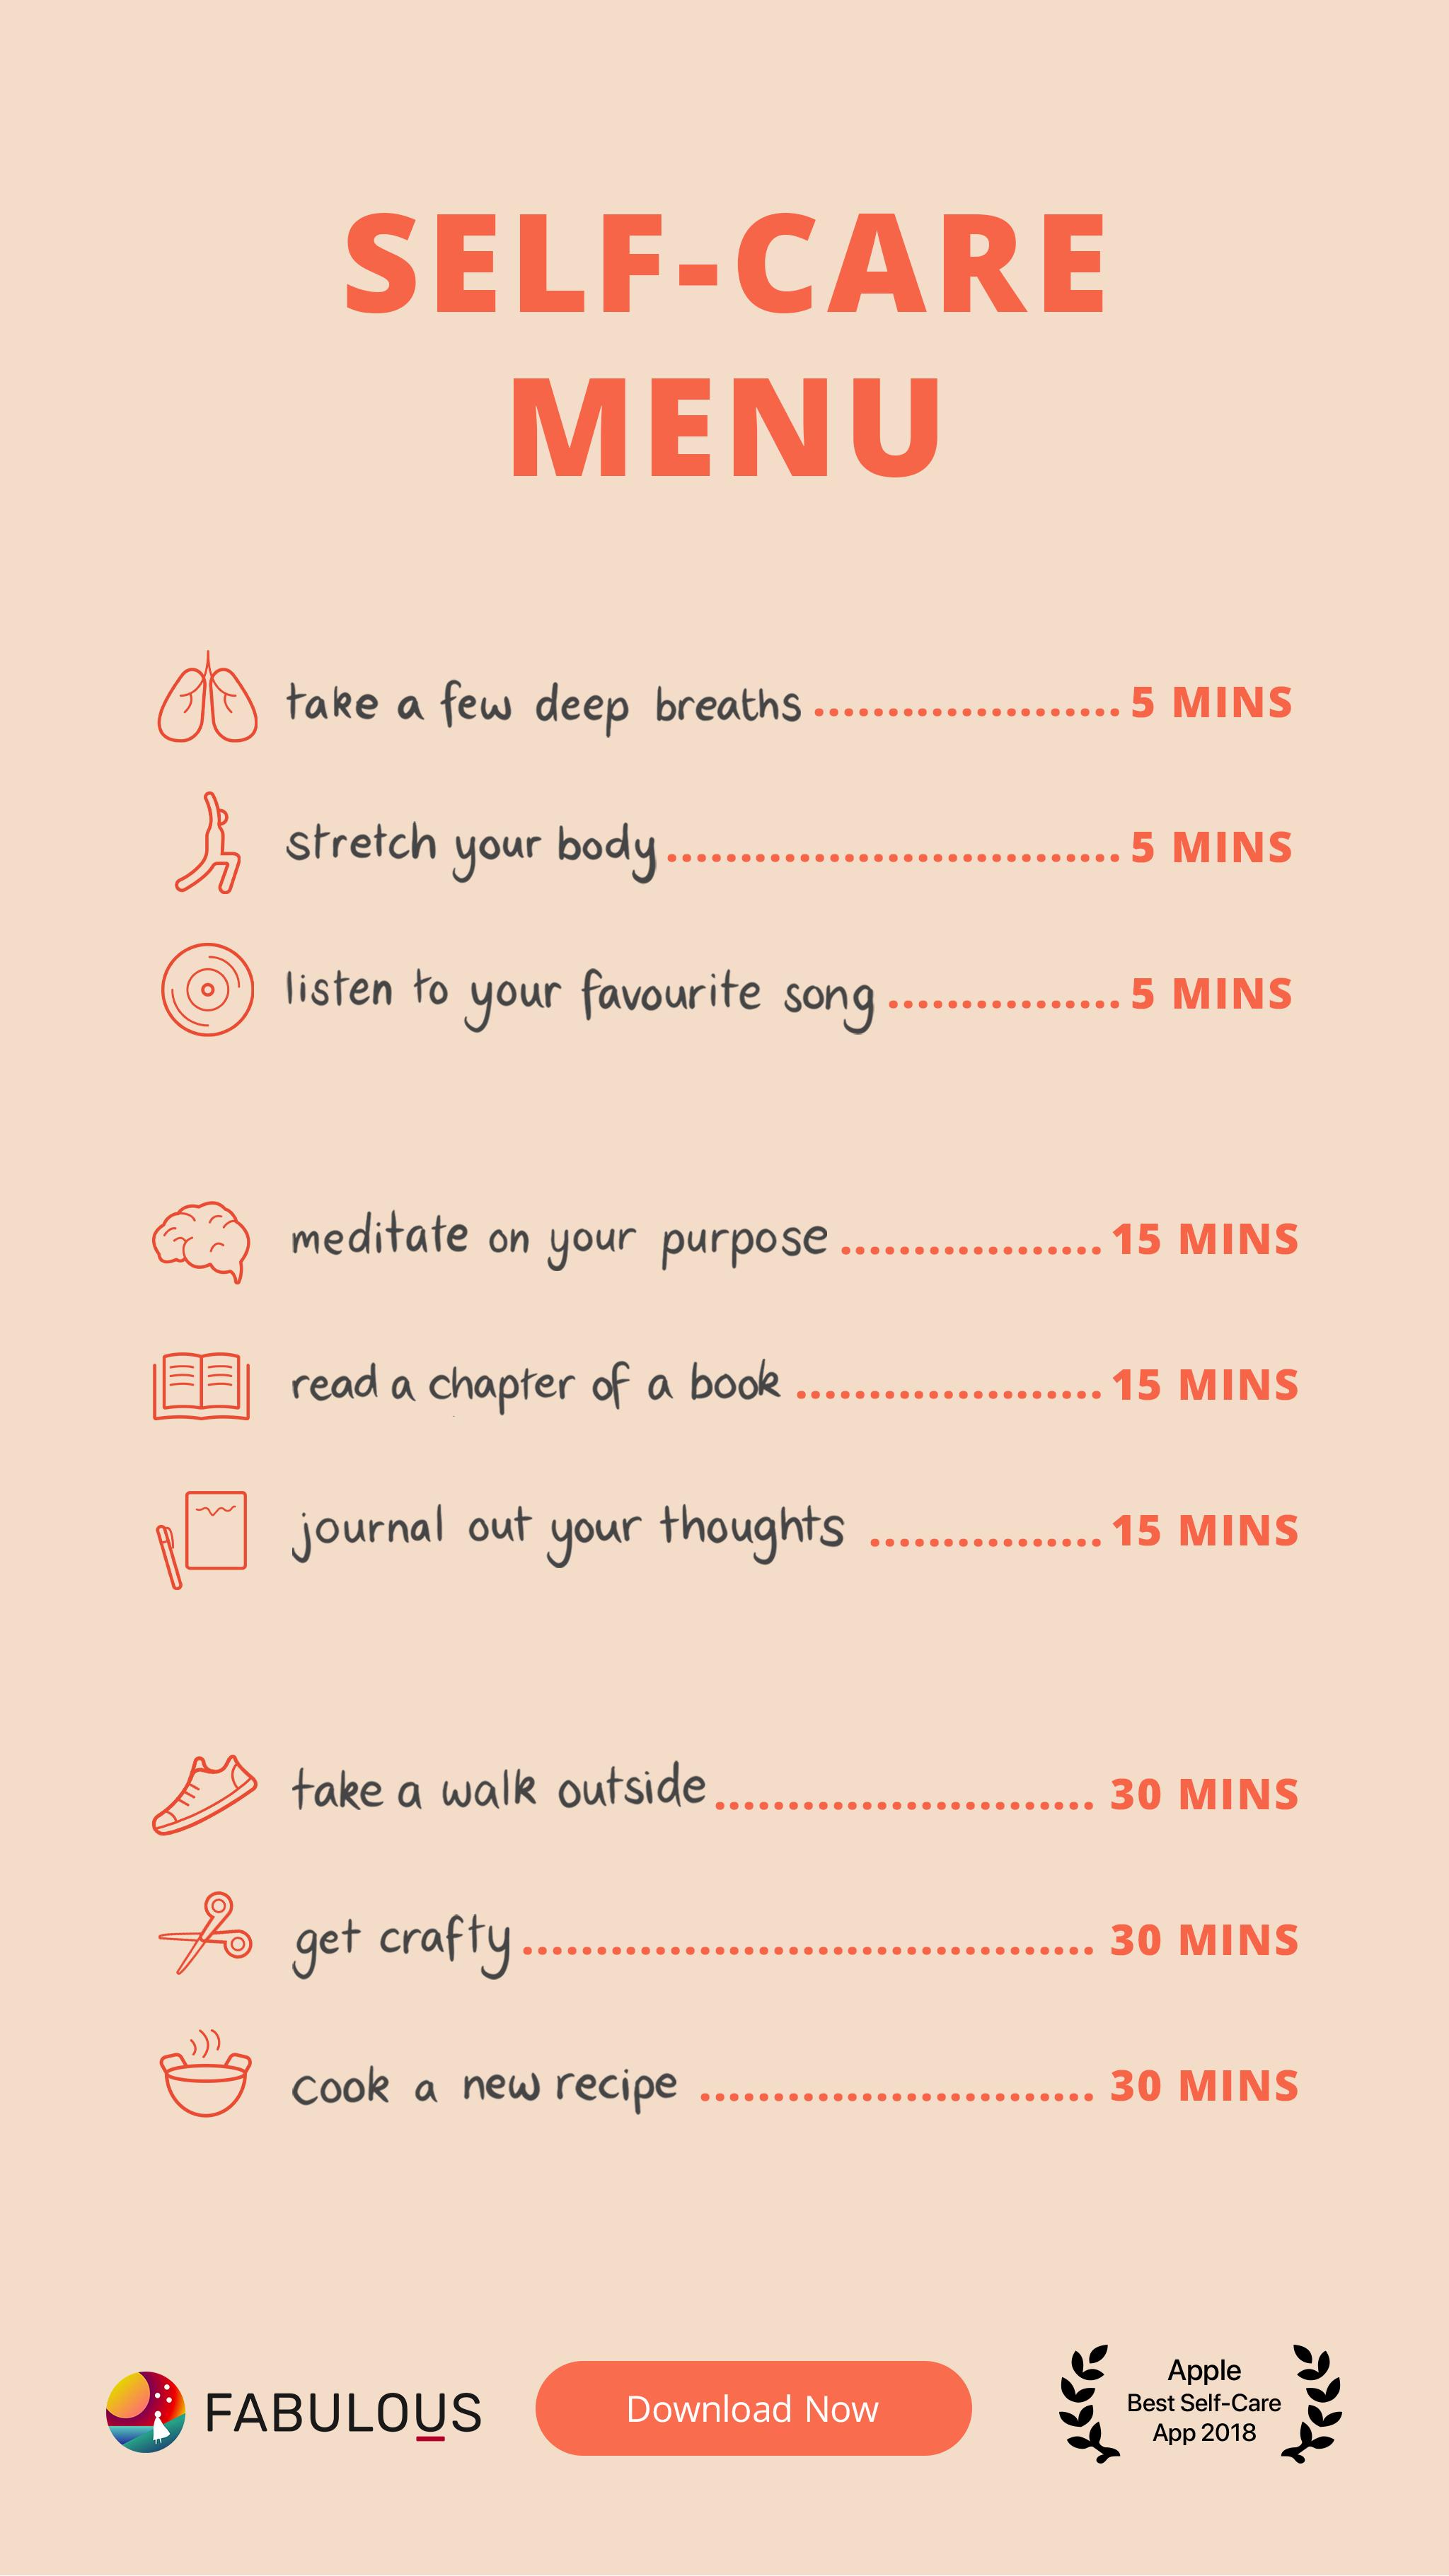 Your Daily Self Care Menu